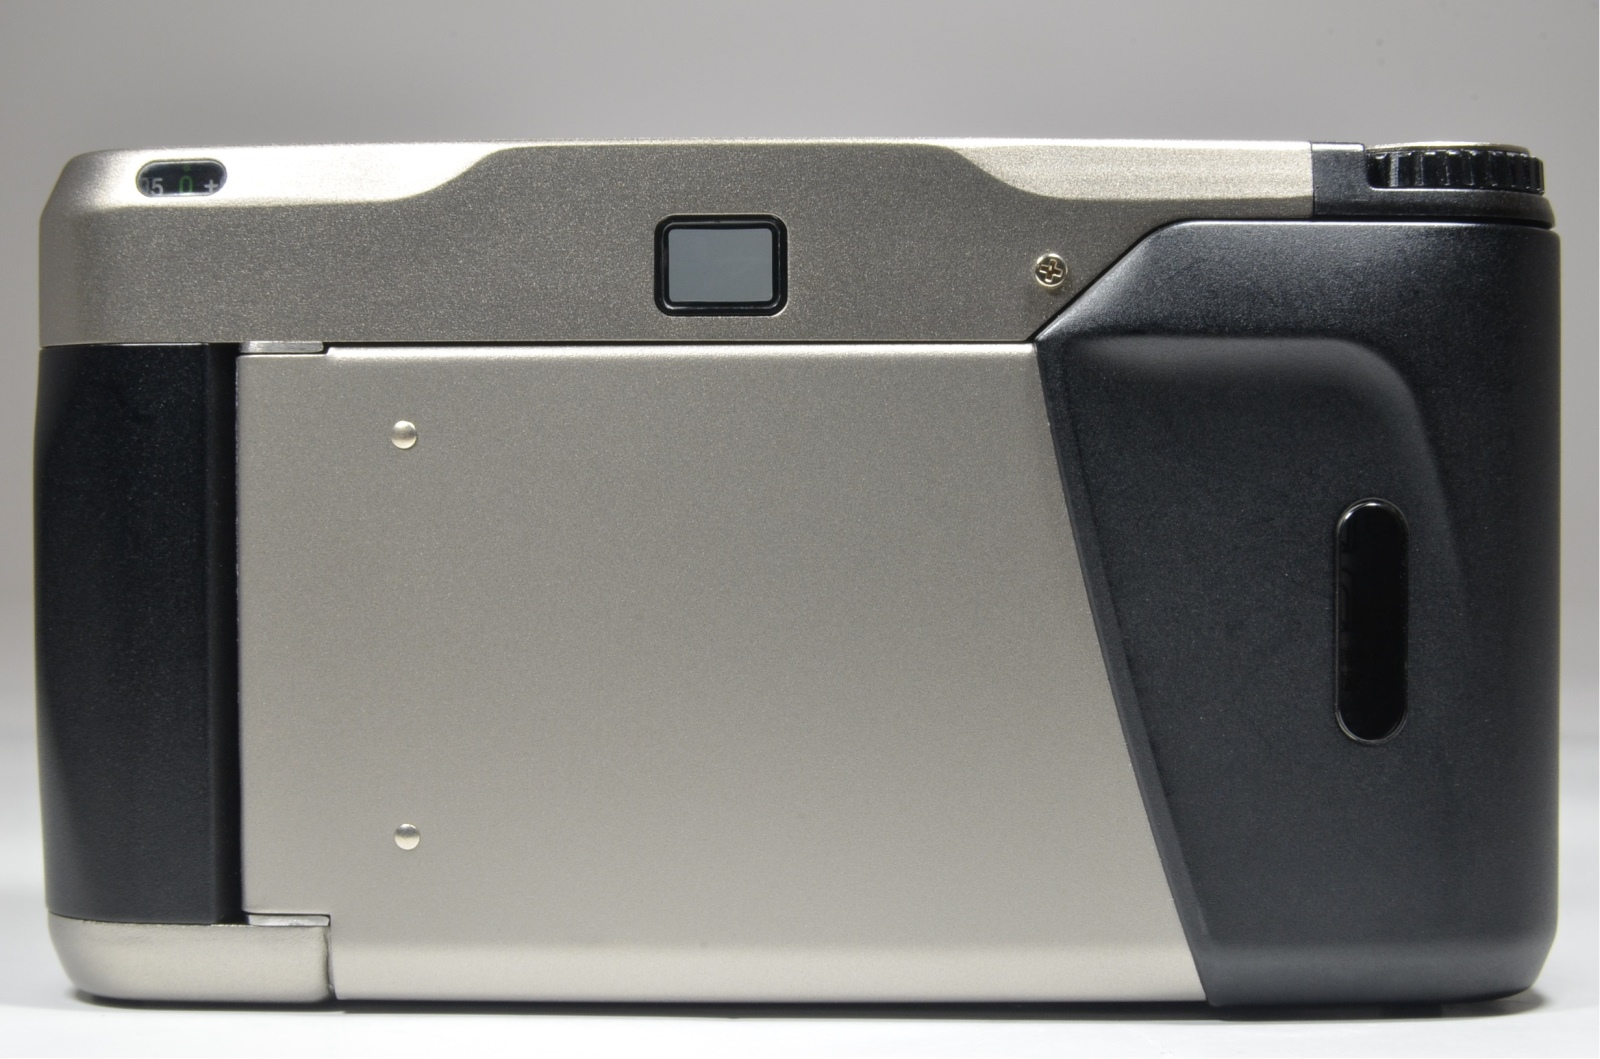 contax t2 titanium silver 35mm film camera full leather case